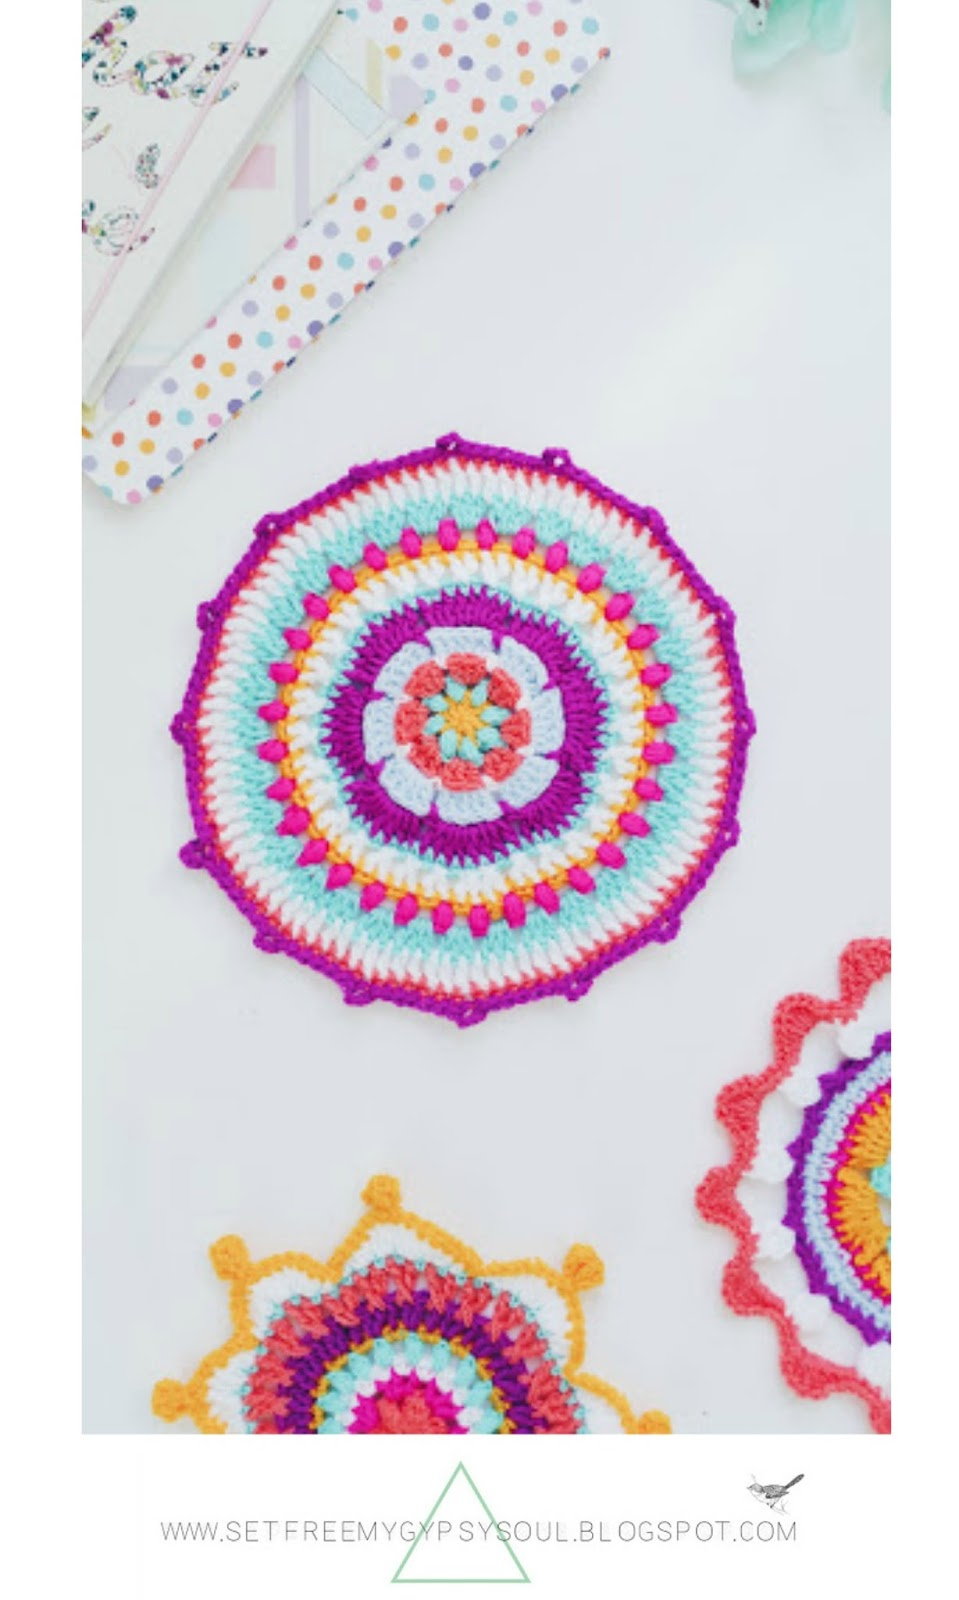 Bohemian Embroidery Patterns Set Free My Gypsy Soul A Crochet Craft Blog 3 Bright Bohemian